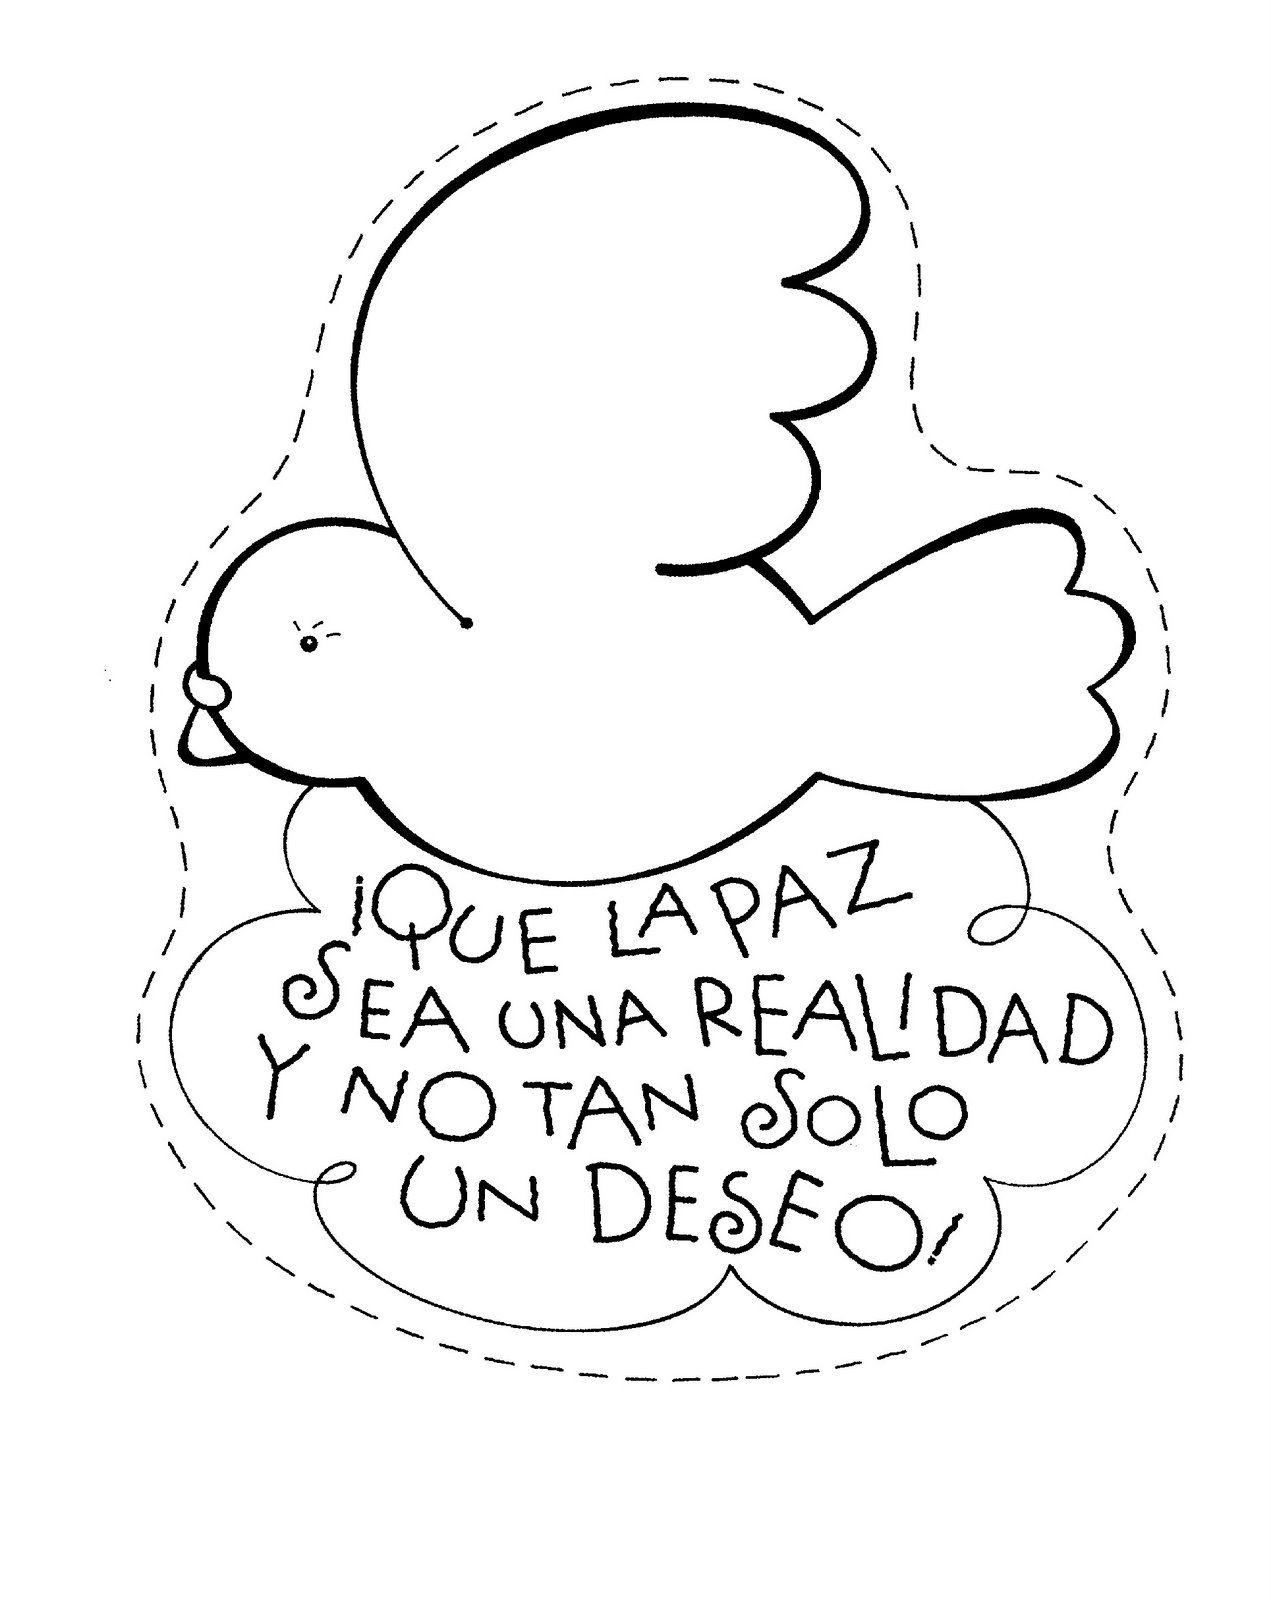 Paloma de la paz con frase.